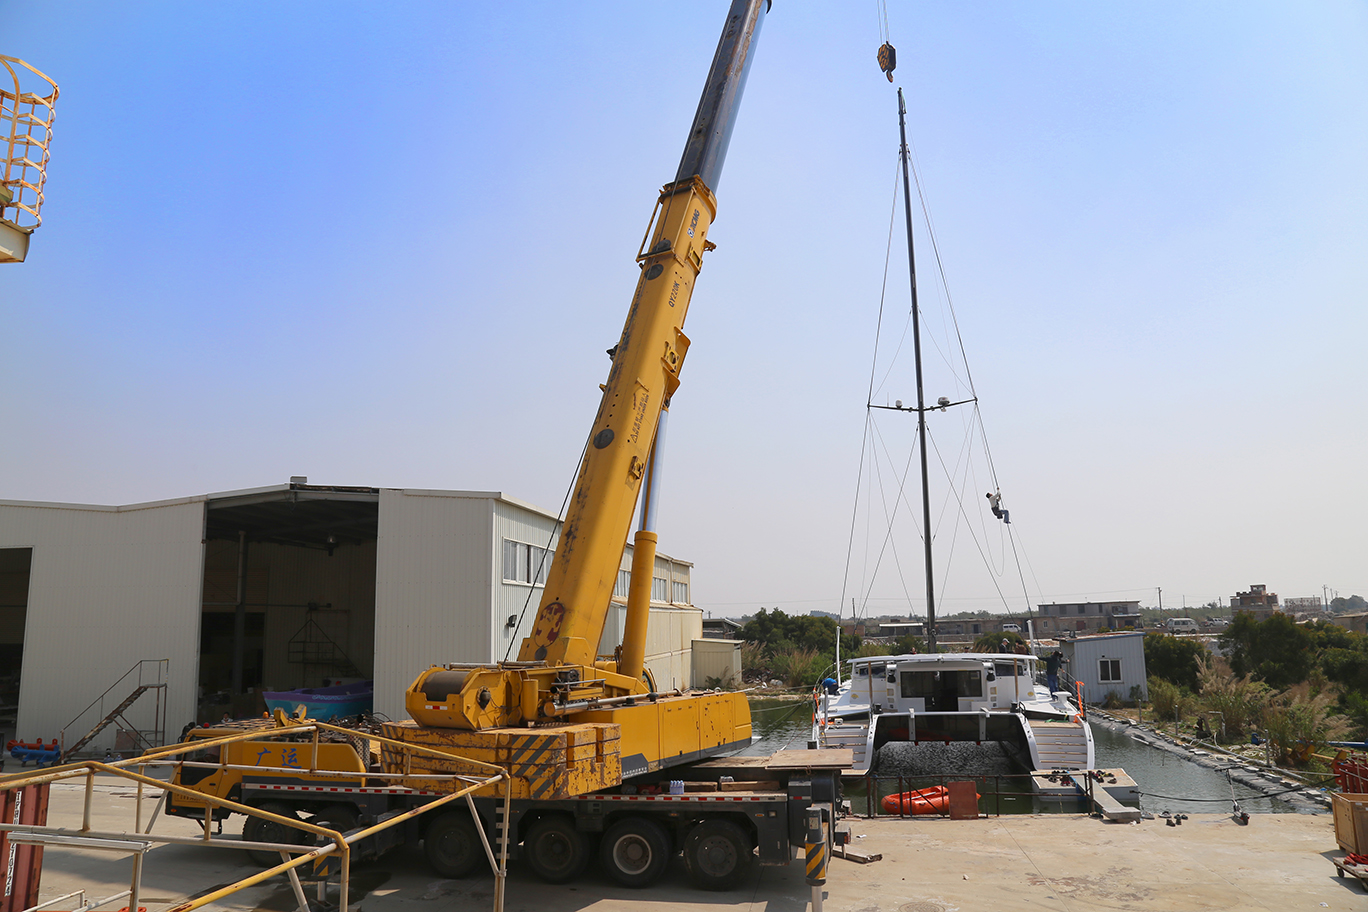 HH6601 Destepping the Mast